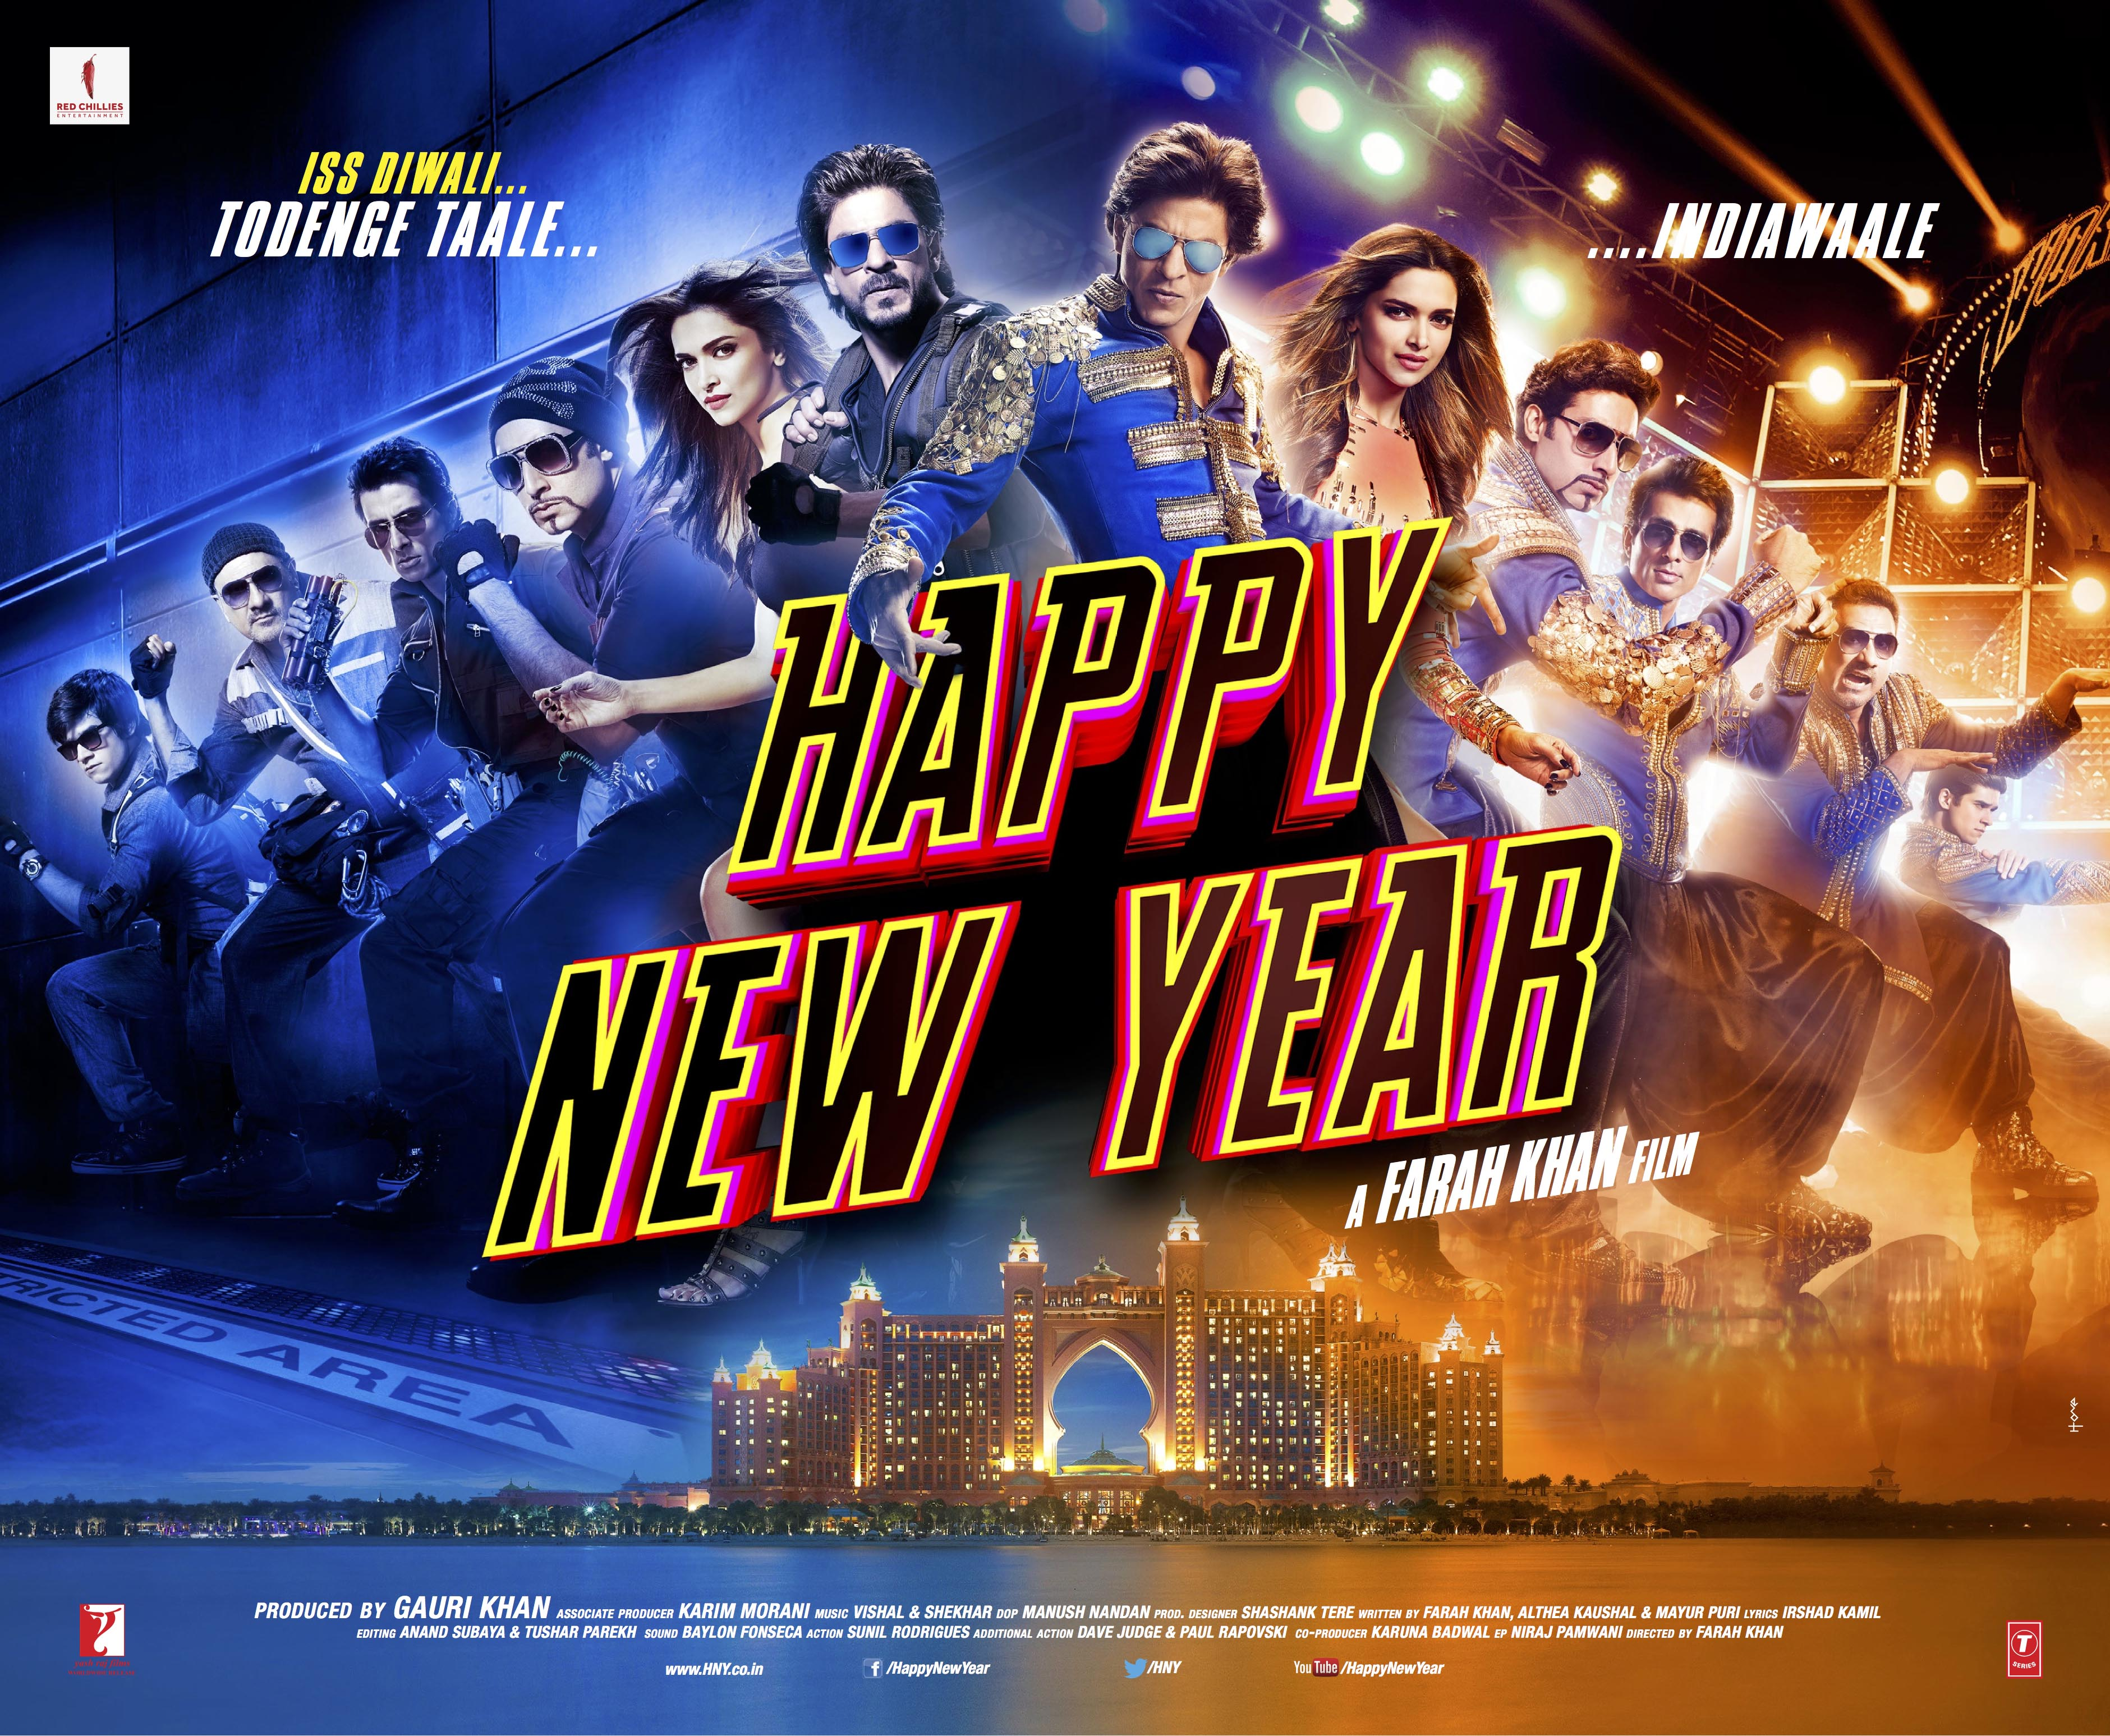 Happy New Year Movie Poster Shahrukh Khan, Deepika Padukone - Full HD Wallpaper